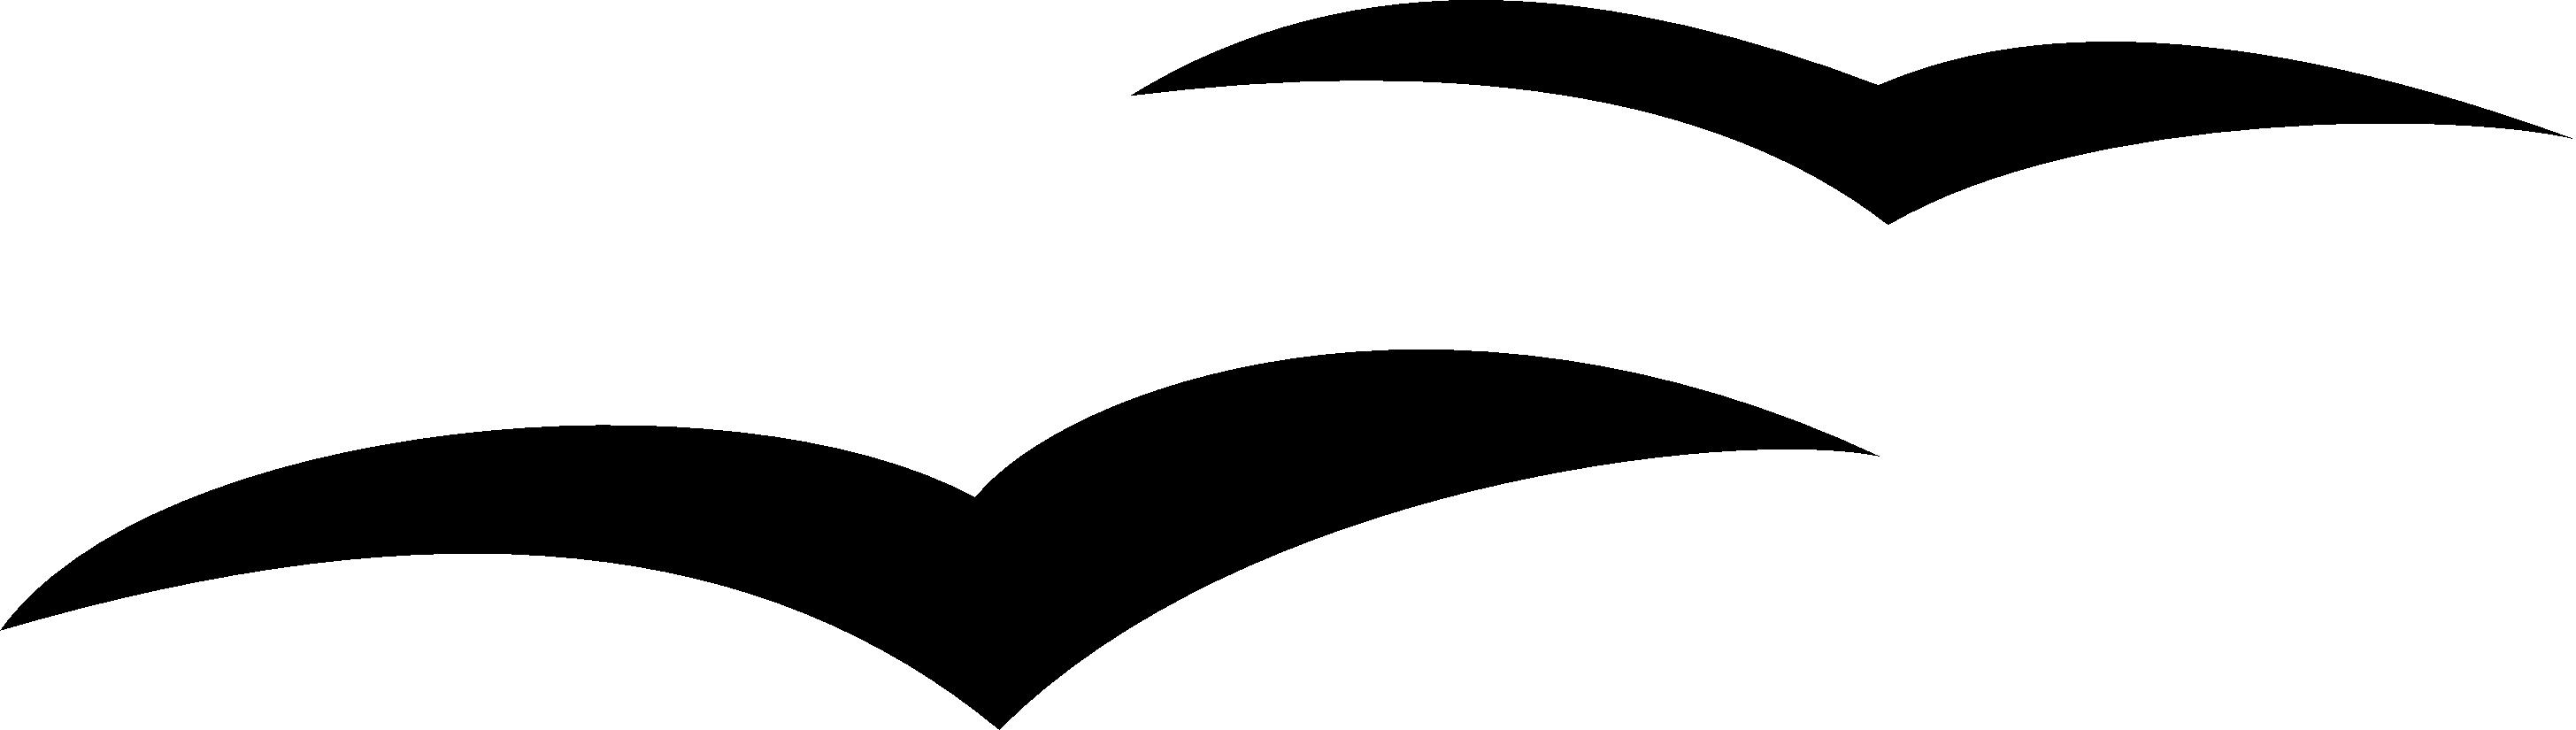 seagull silhouette clip art - HD2911×825